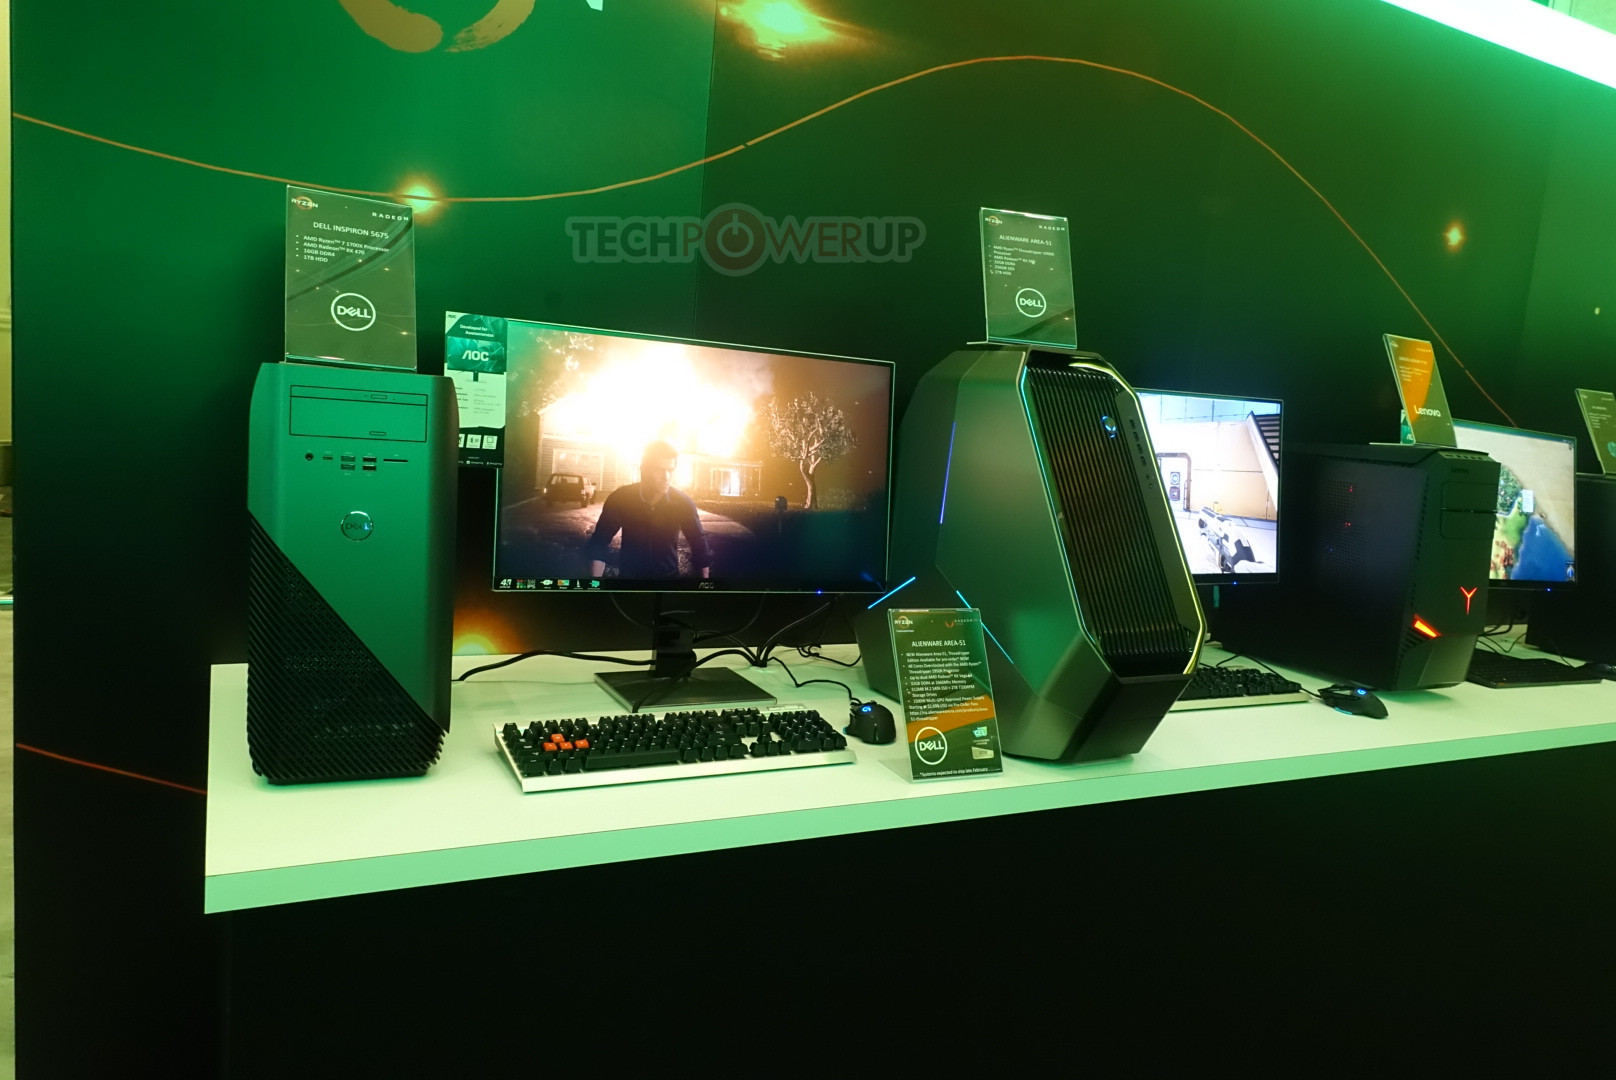 AMD Ryzen Mobile da vida a nuevos equiposAMD Ryzen Mobile da vida a nuevos equipos